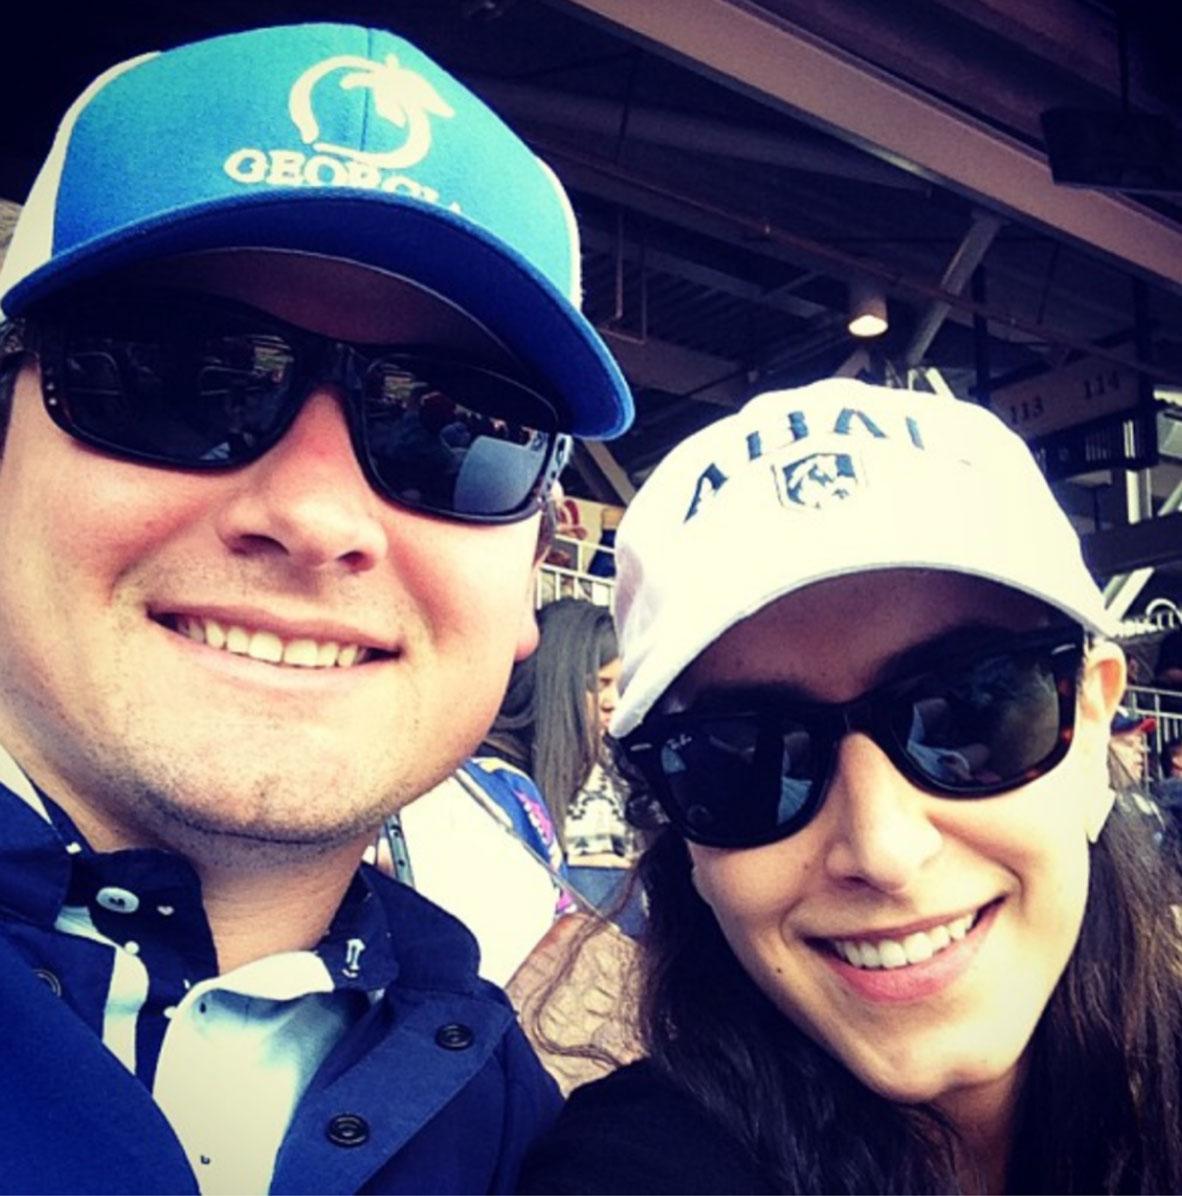 Closeup of man and woman wearing baseball caps and sunglasses